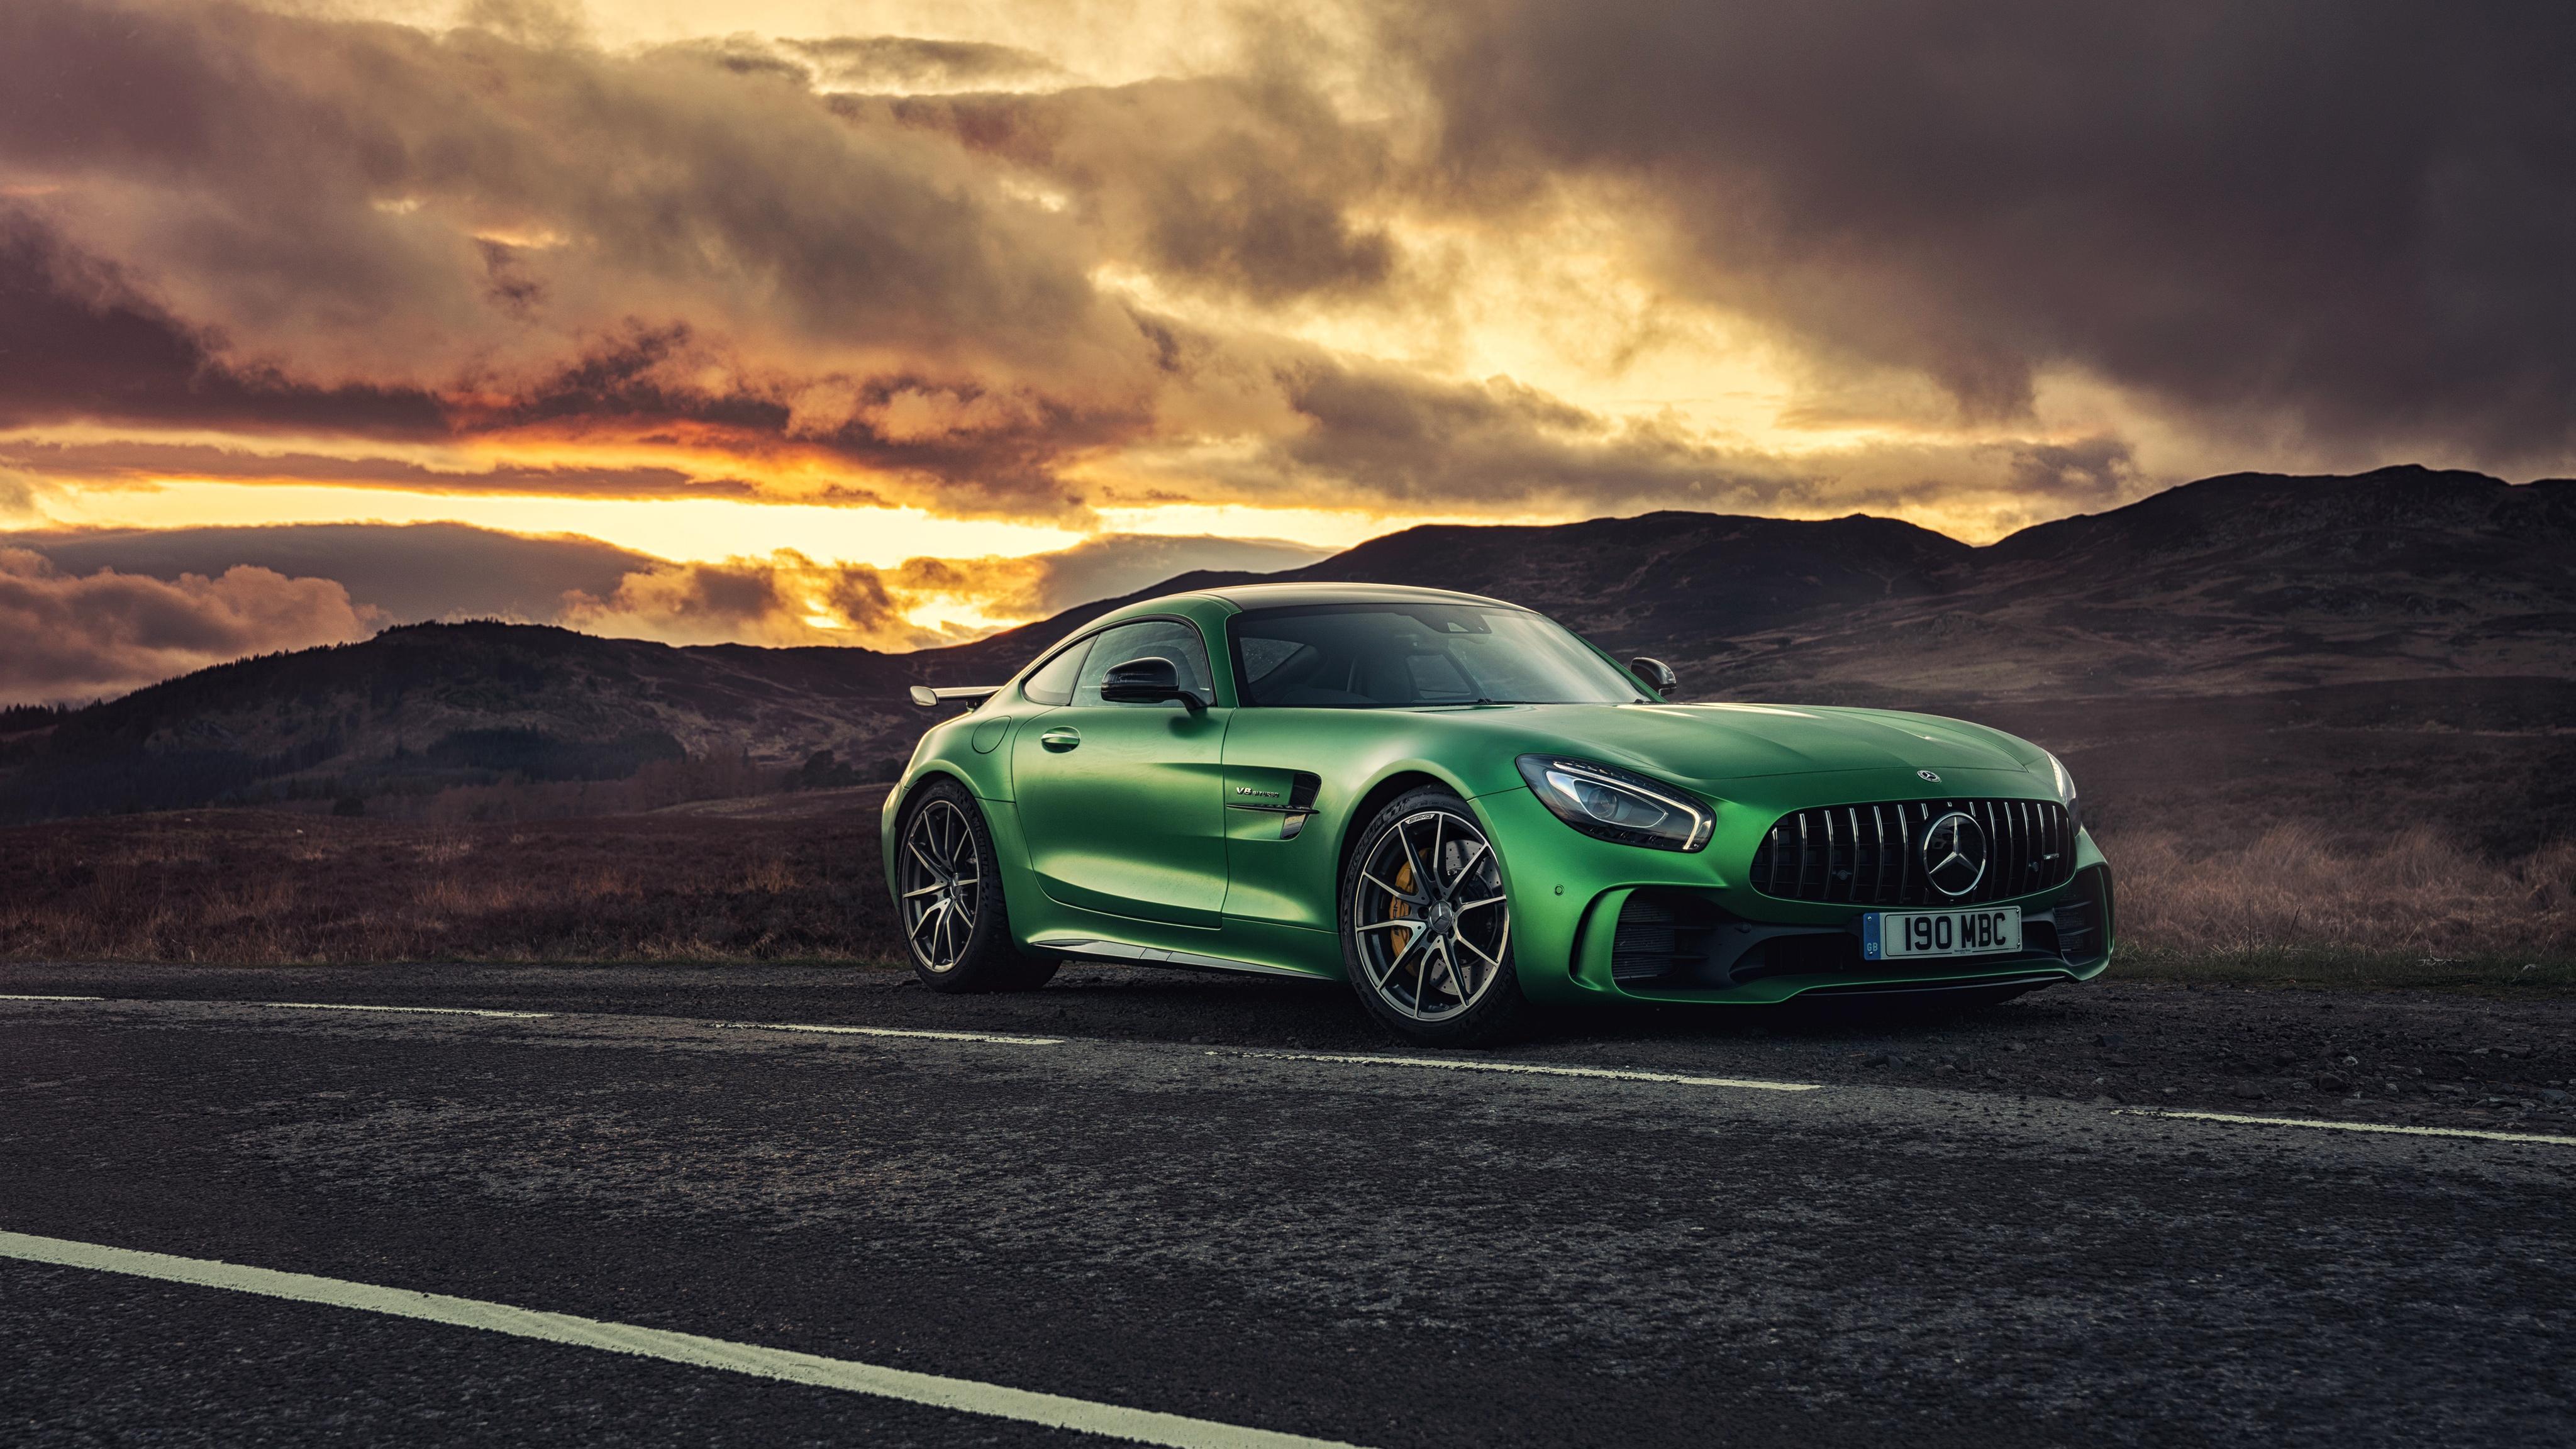 Mercedes-Benz Wallpapers - Top Free